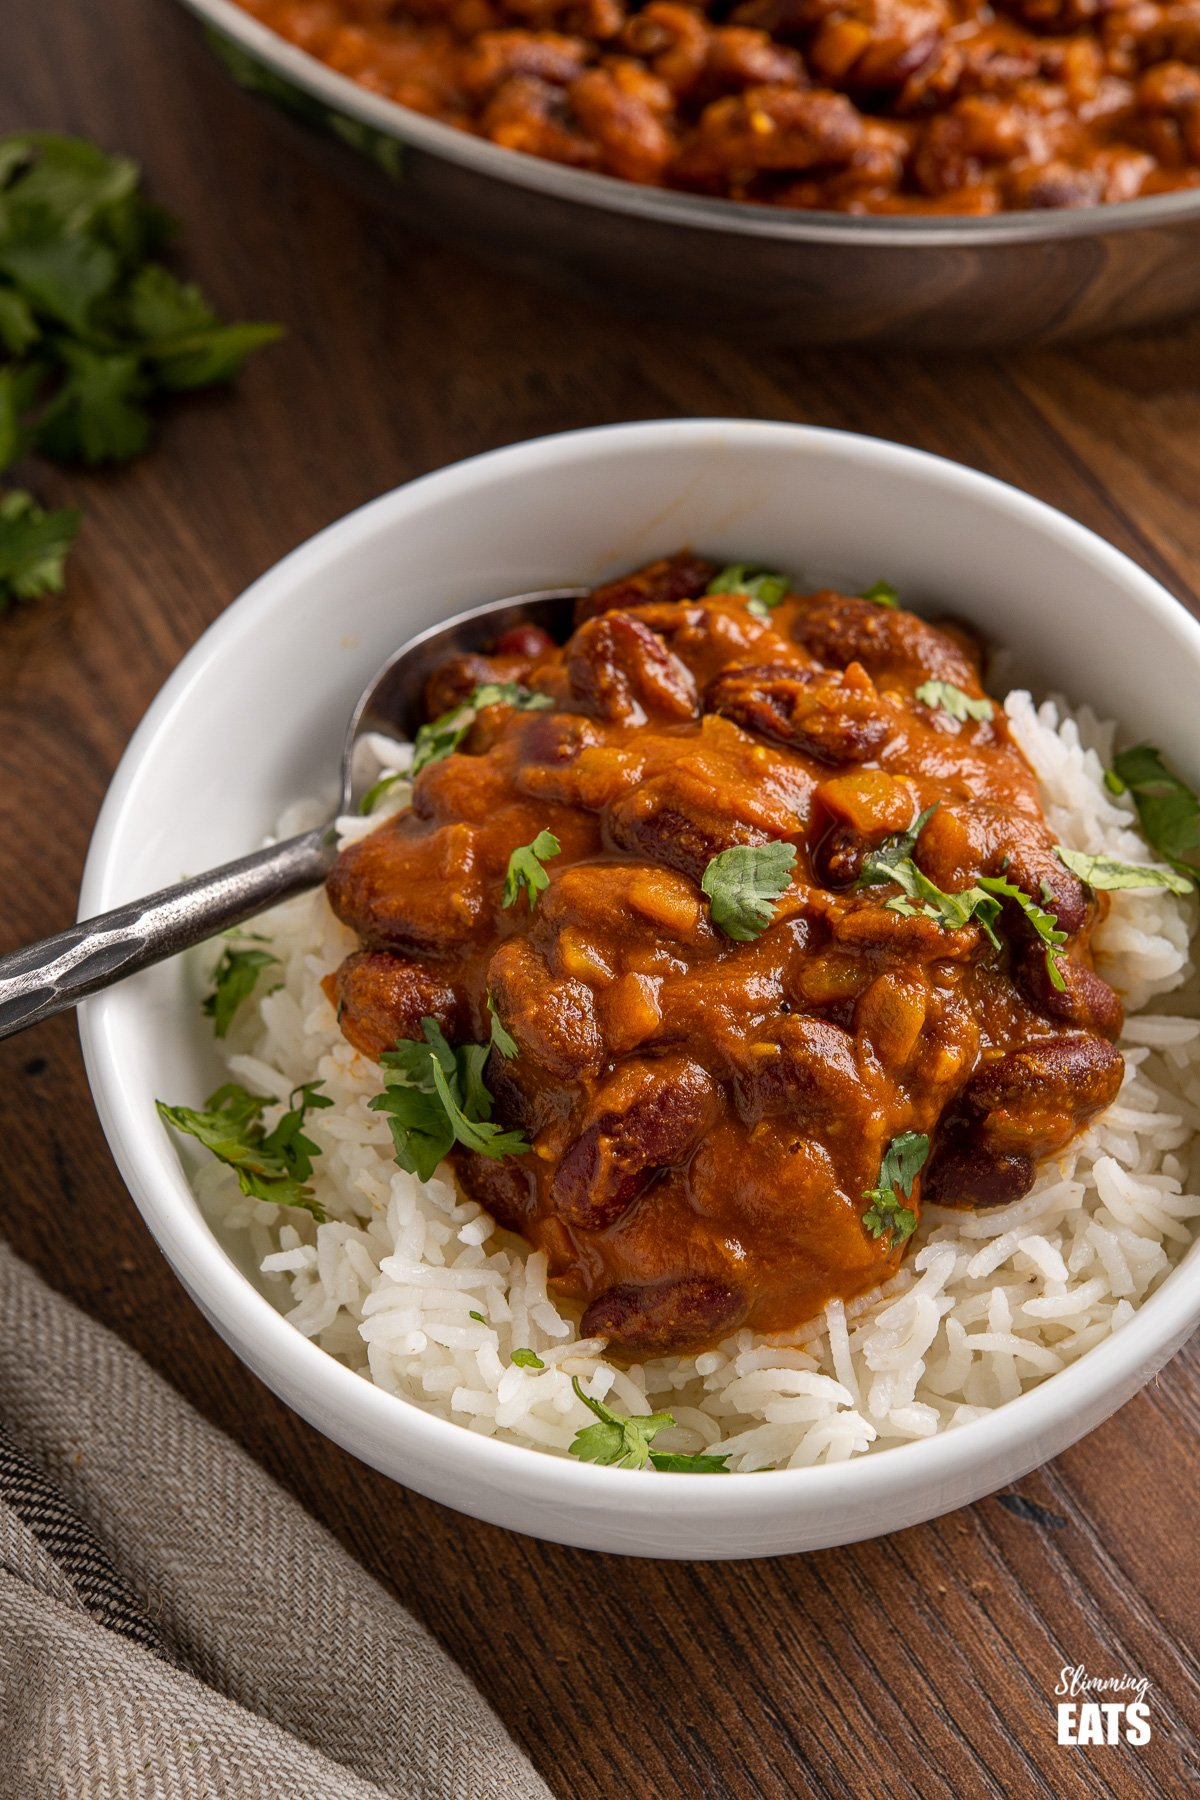 kidney bean curry (rajma) over basmati rice in white bowl